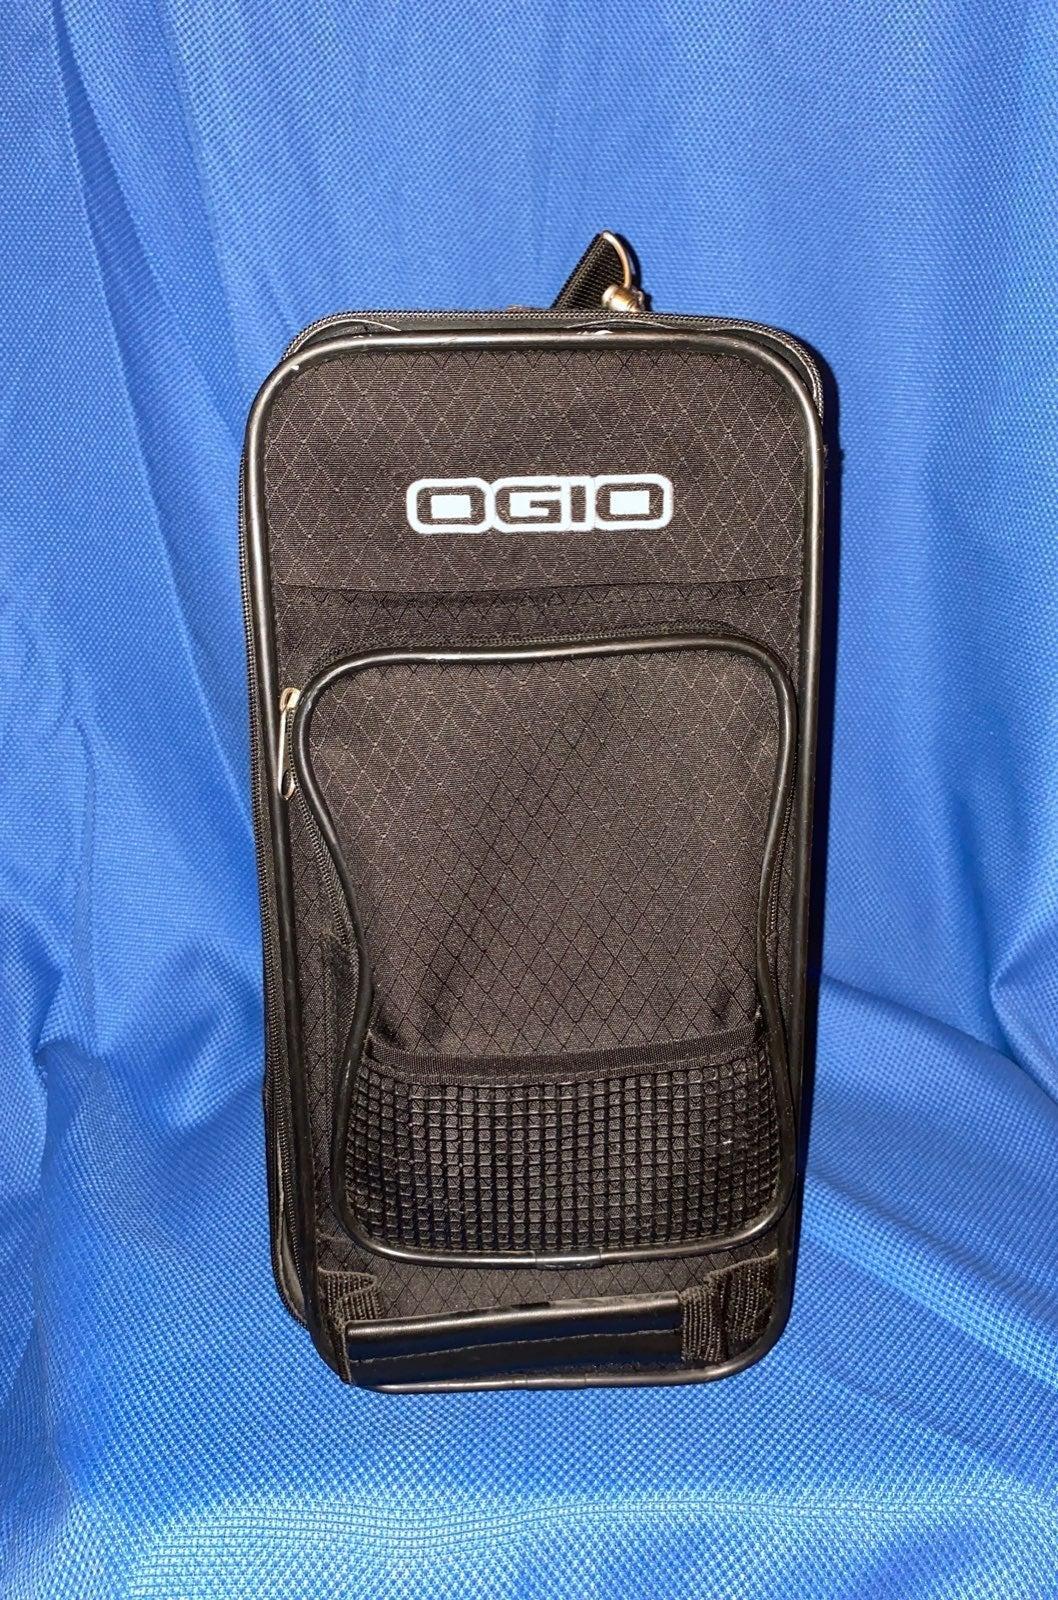 Ogio Locker Bag